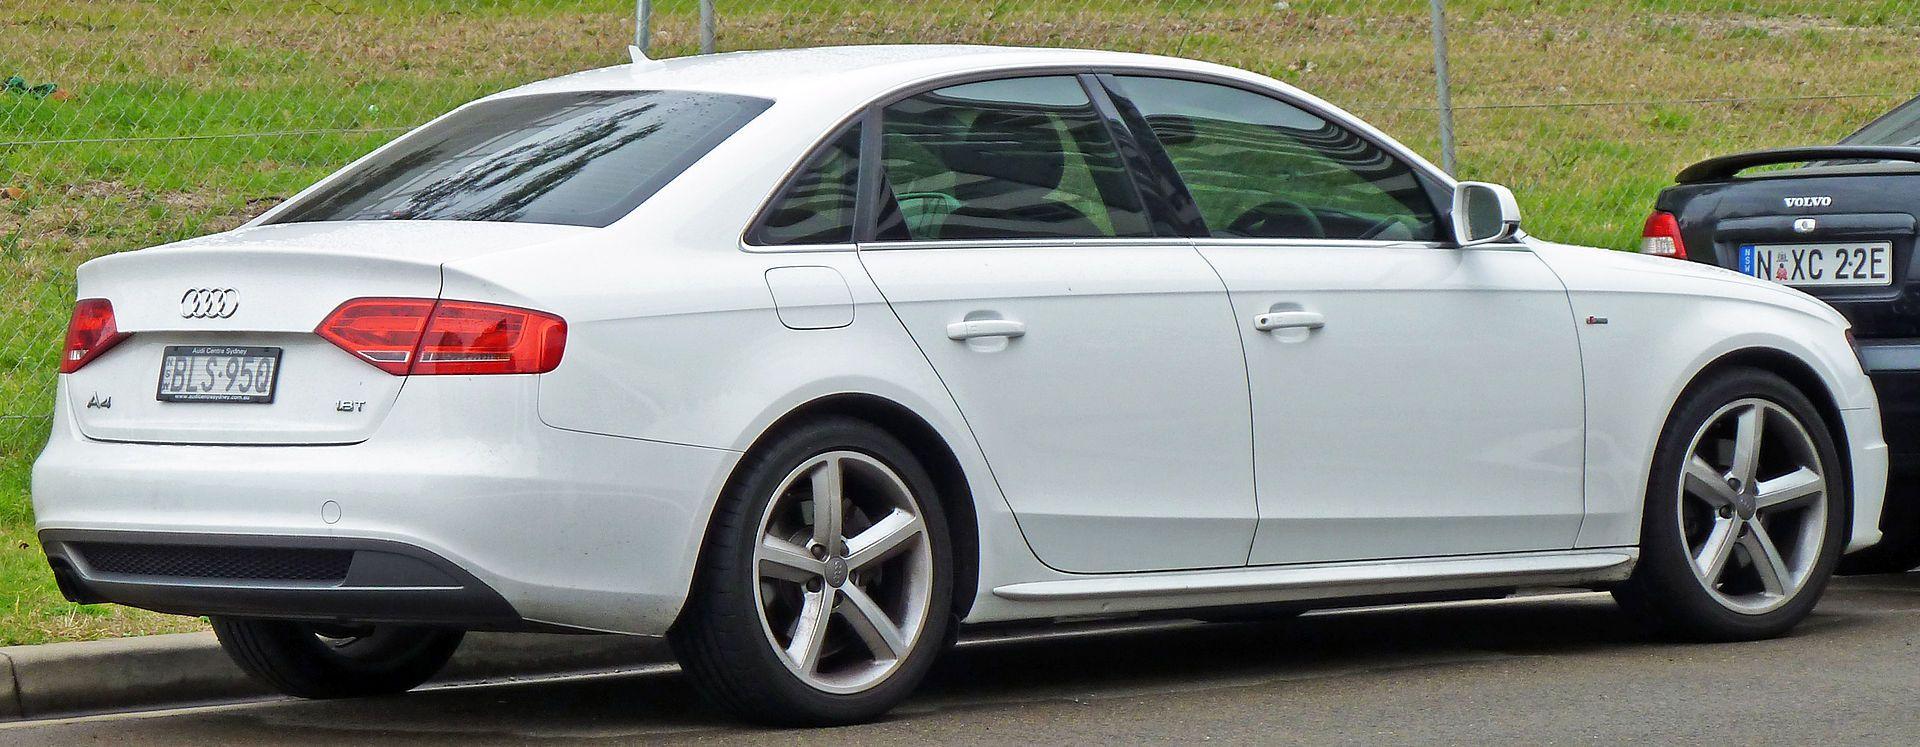 2008 2010 Audi A4 8k 1 8 Tfsi Sedan 01 Audi A4 Wikipedia Audi A4 Audi 2017 Audi A4